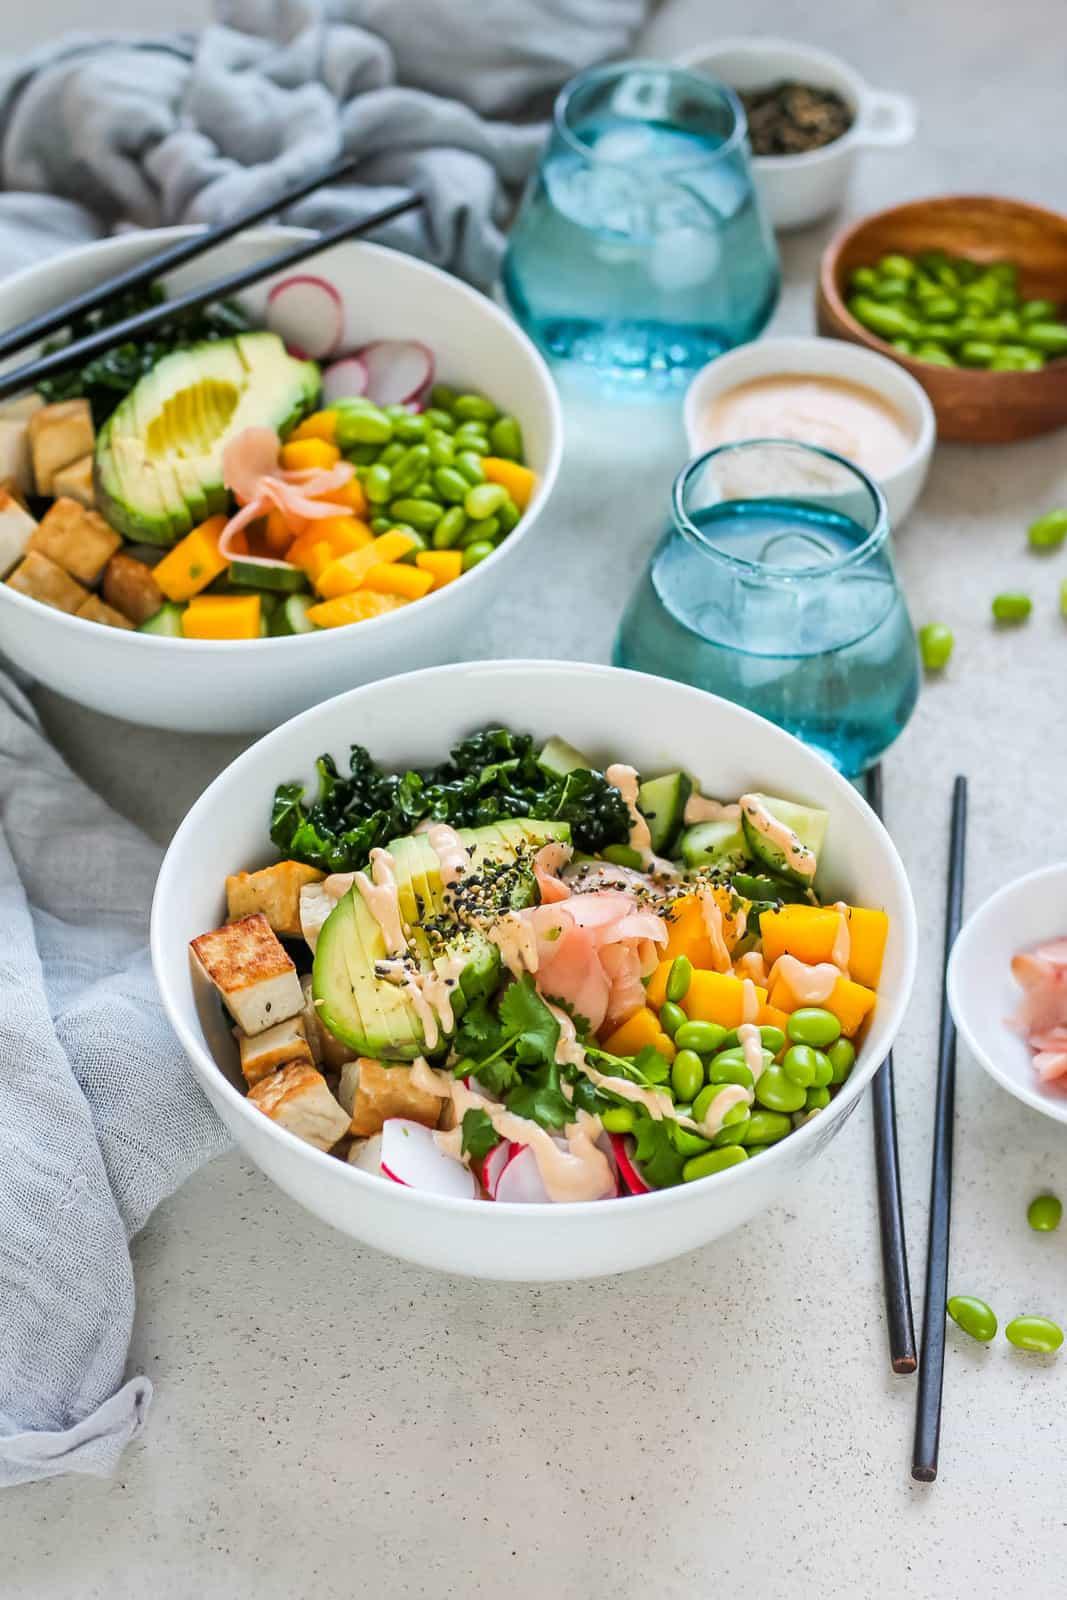 Vegan poké bowls in white bowls topped with avocado